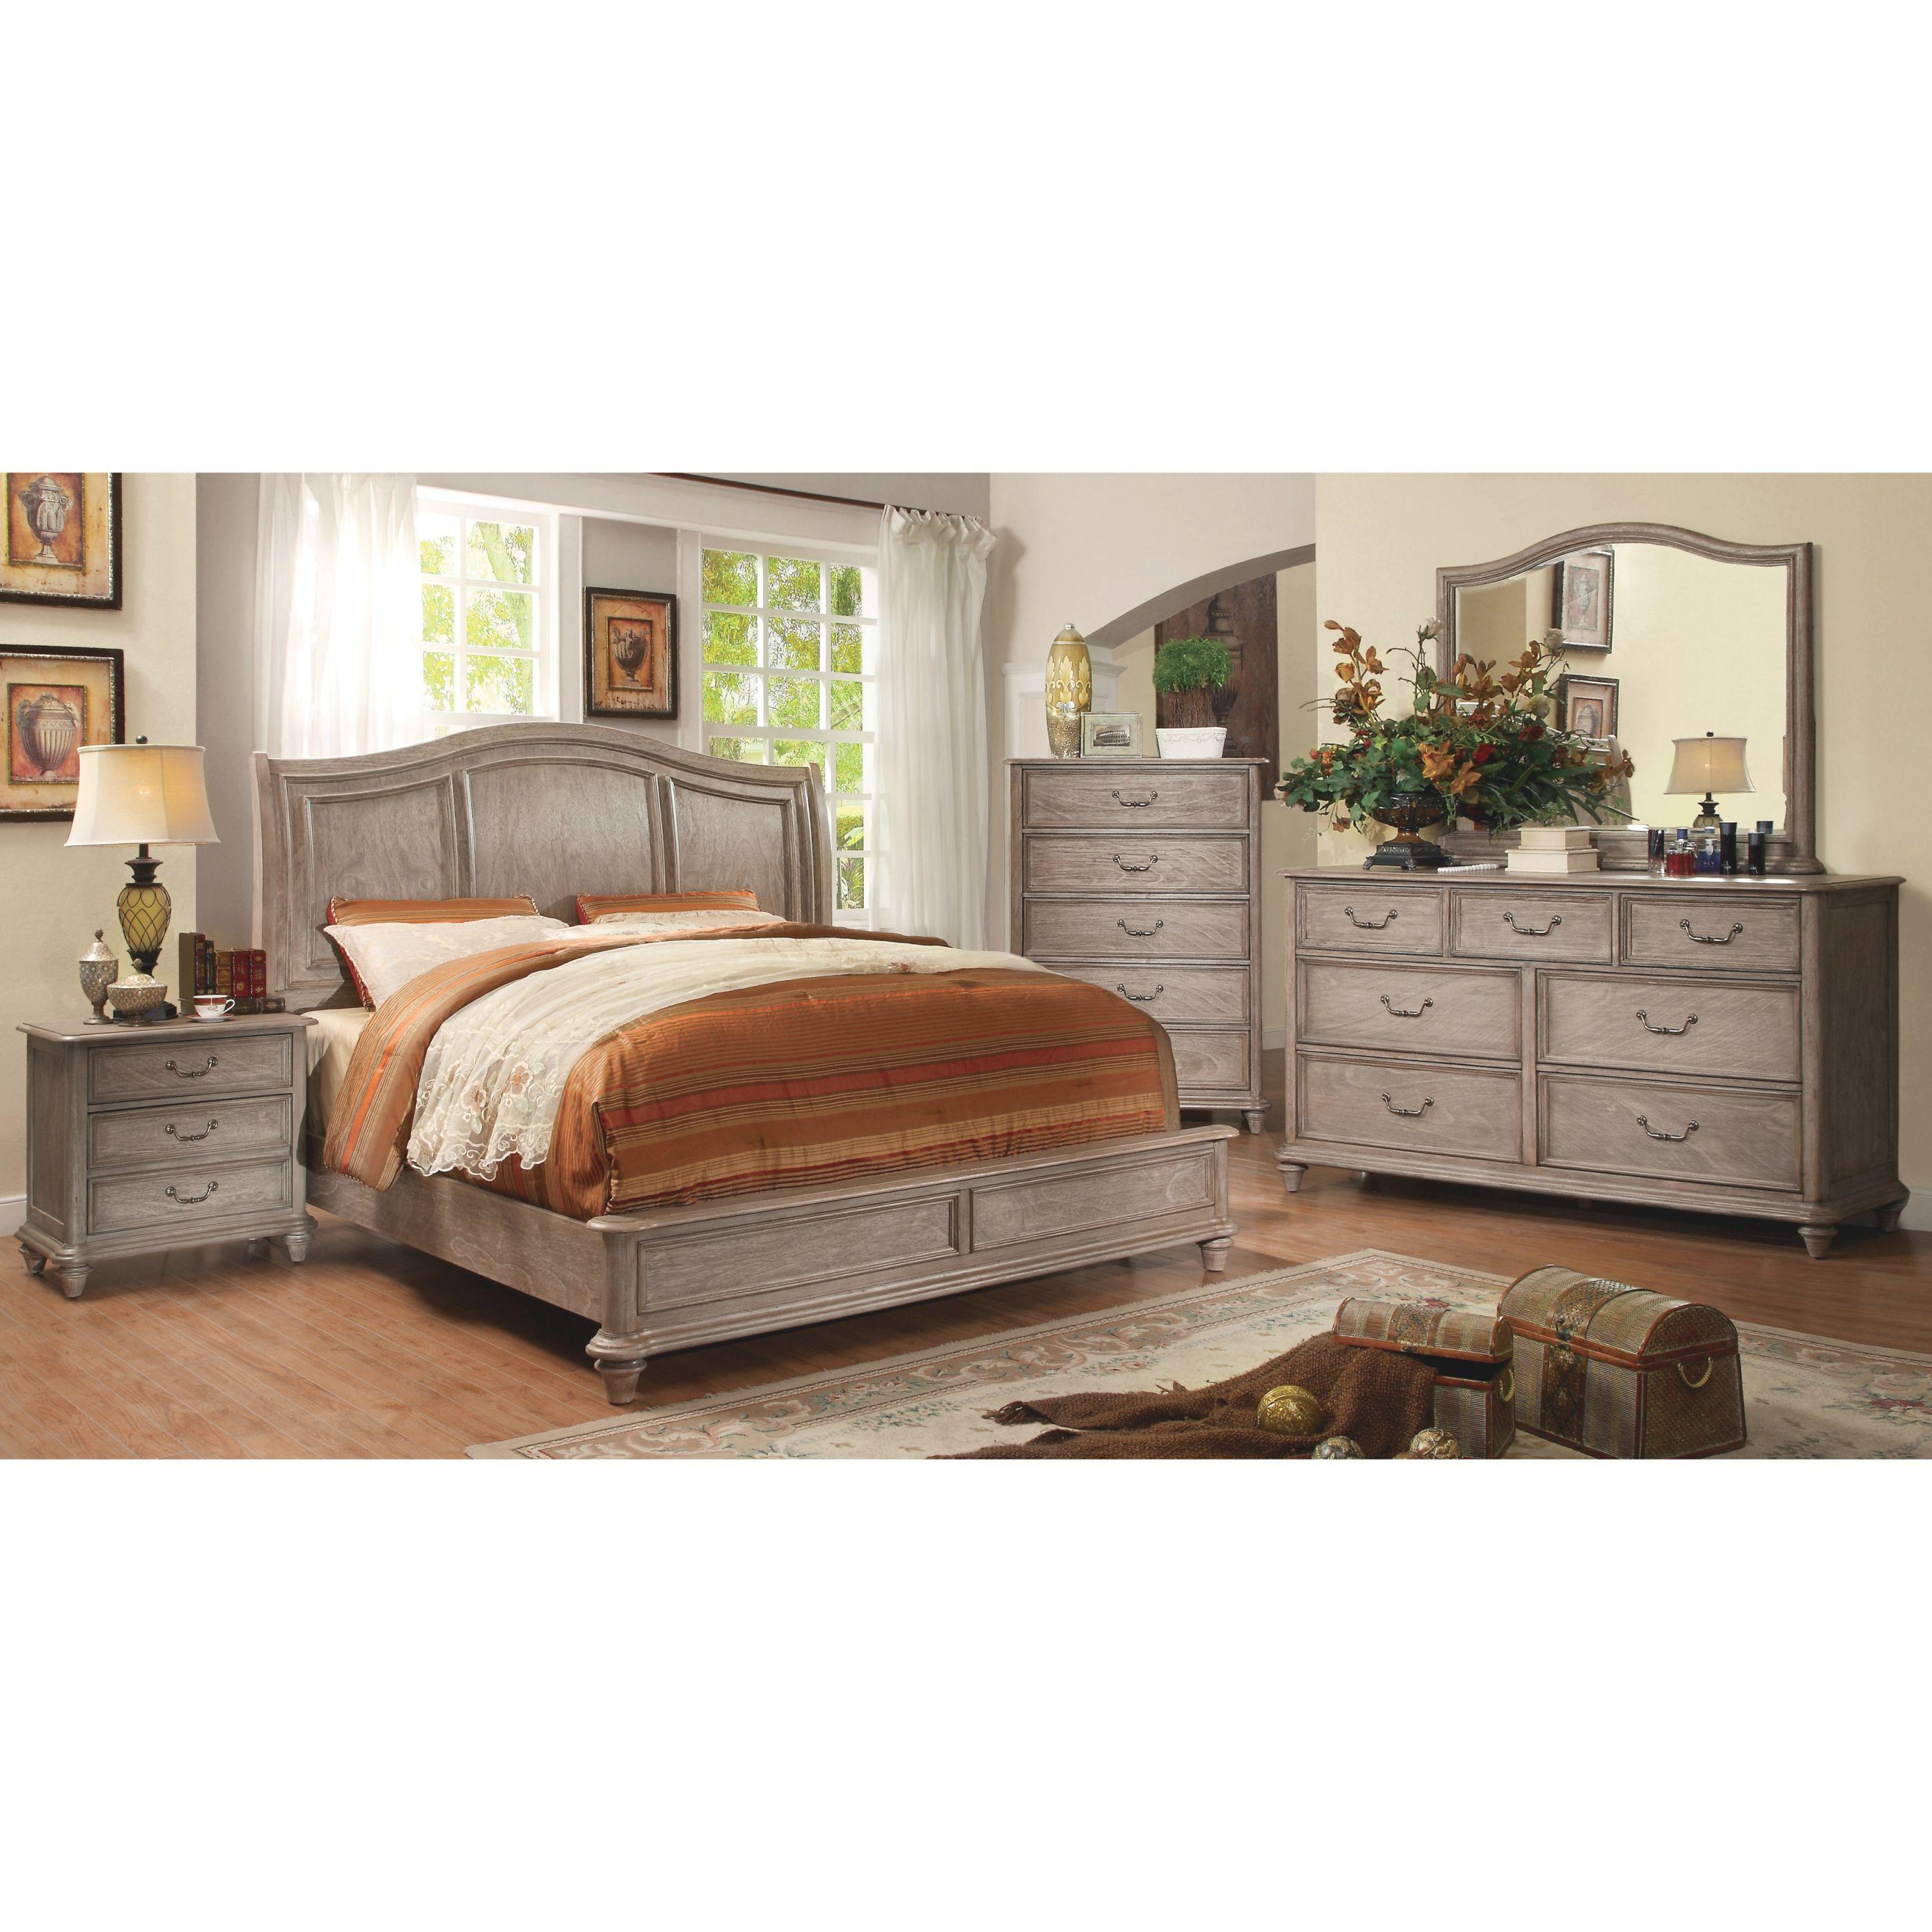 Furniture Of America Minka Farmhouse Rustic Grey 4-Piece ...